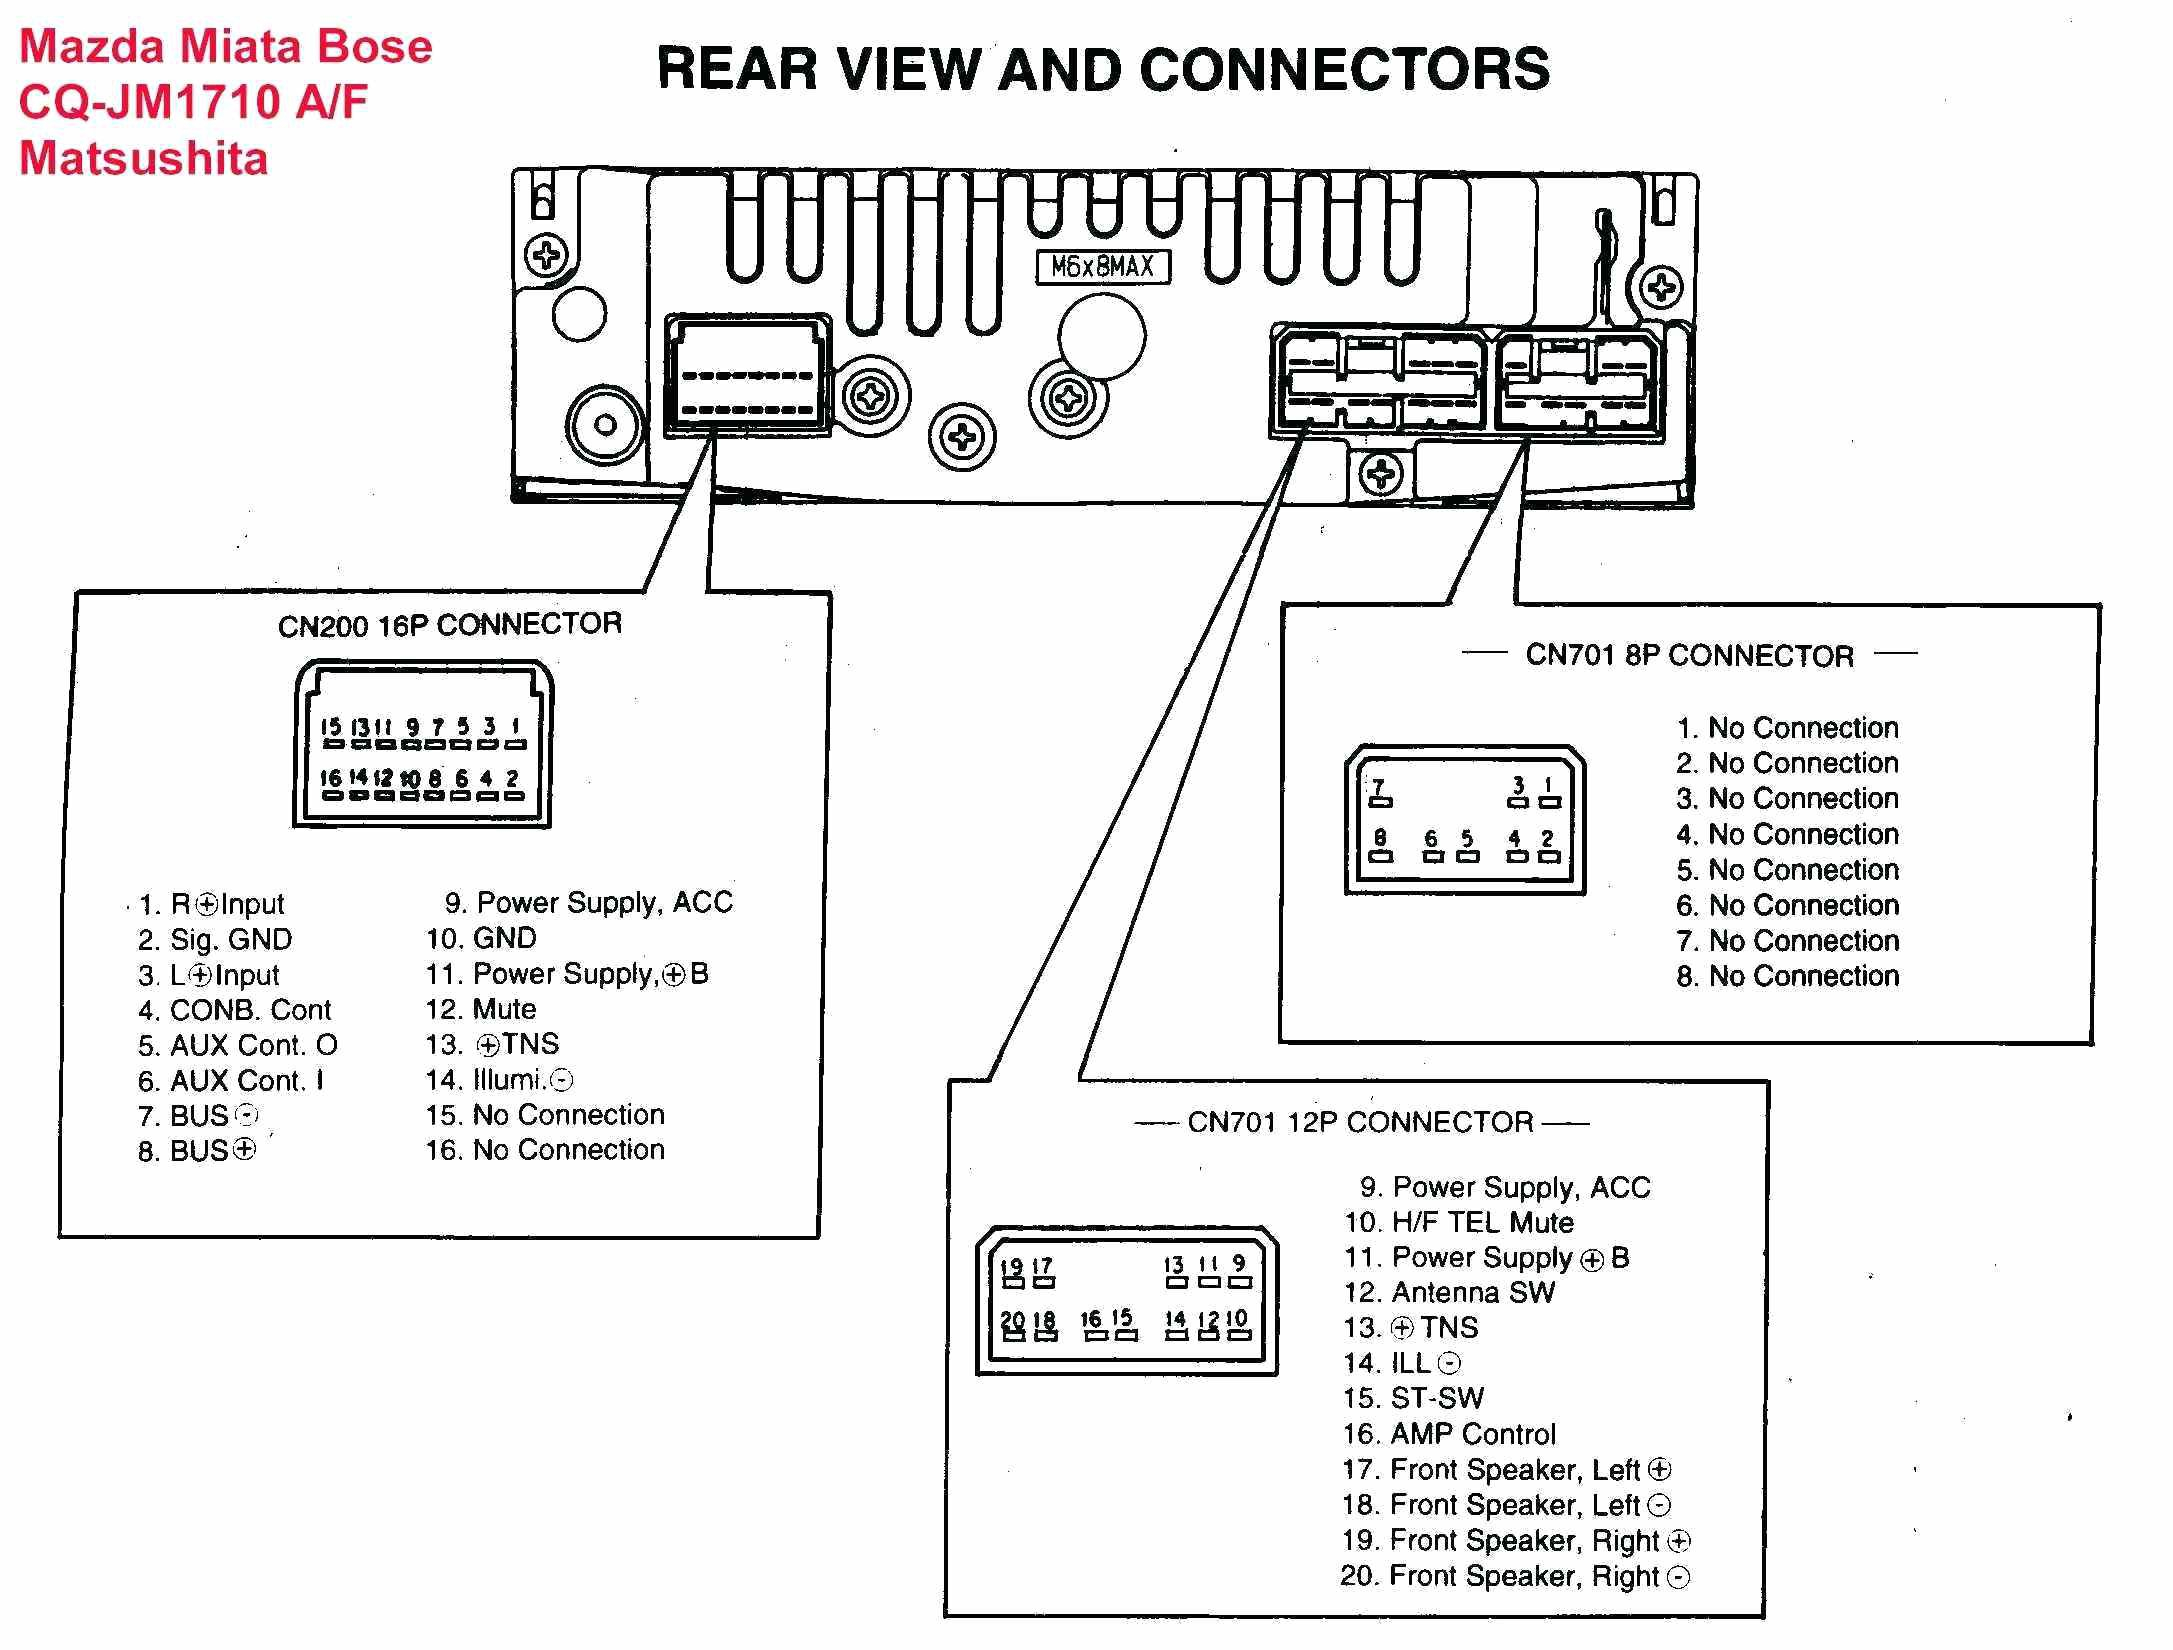 boss plow controller wiring diagram Download-Boss Plow Wiring Diagram New Boss Snow Plow Wiring Diagram Unique Amazing Boss Plow Wiring 18-l